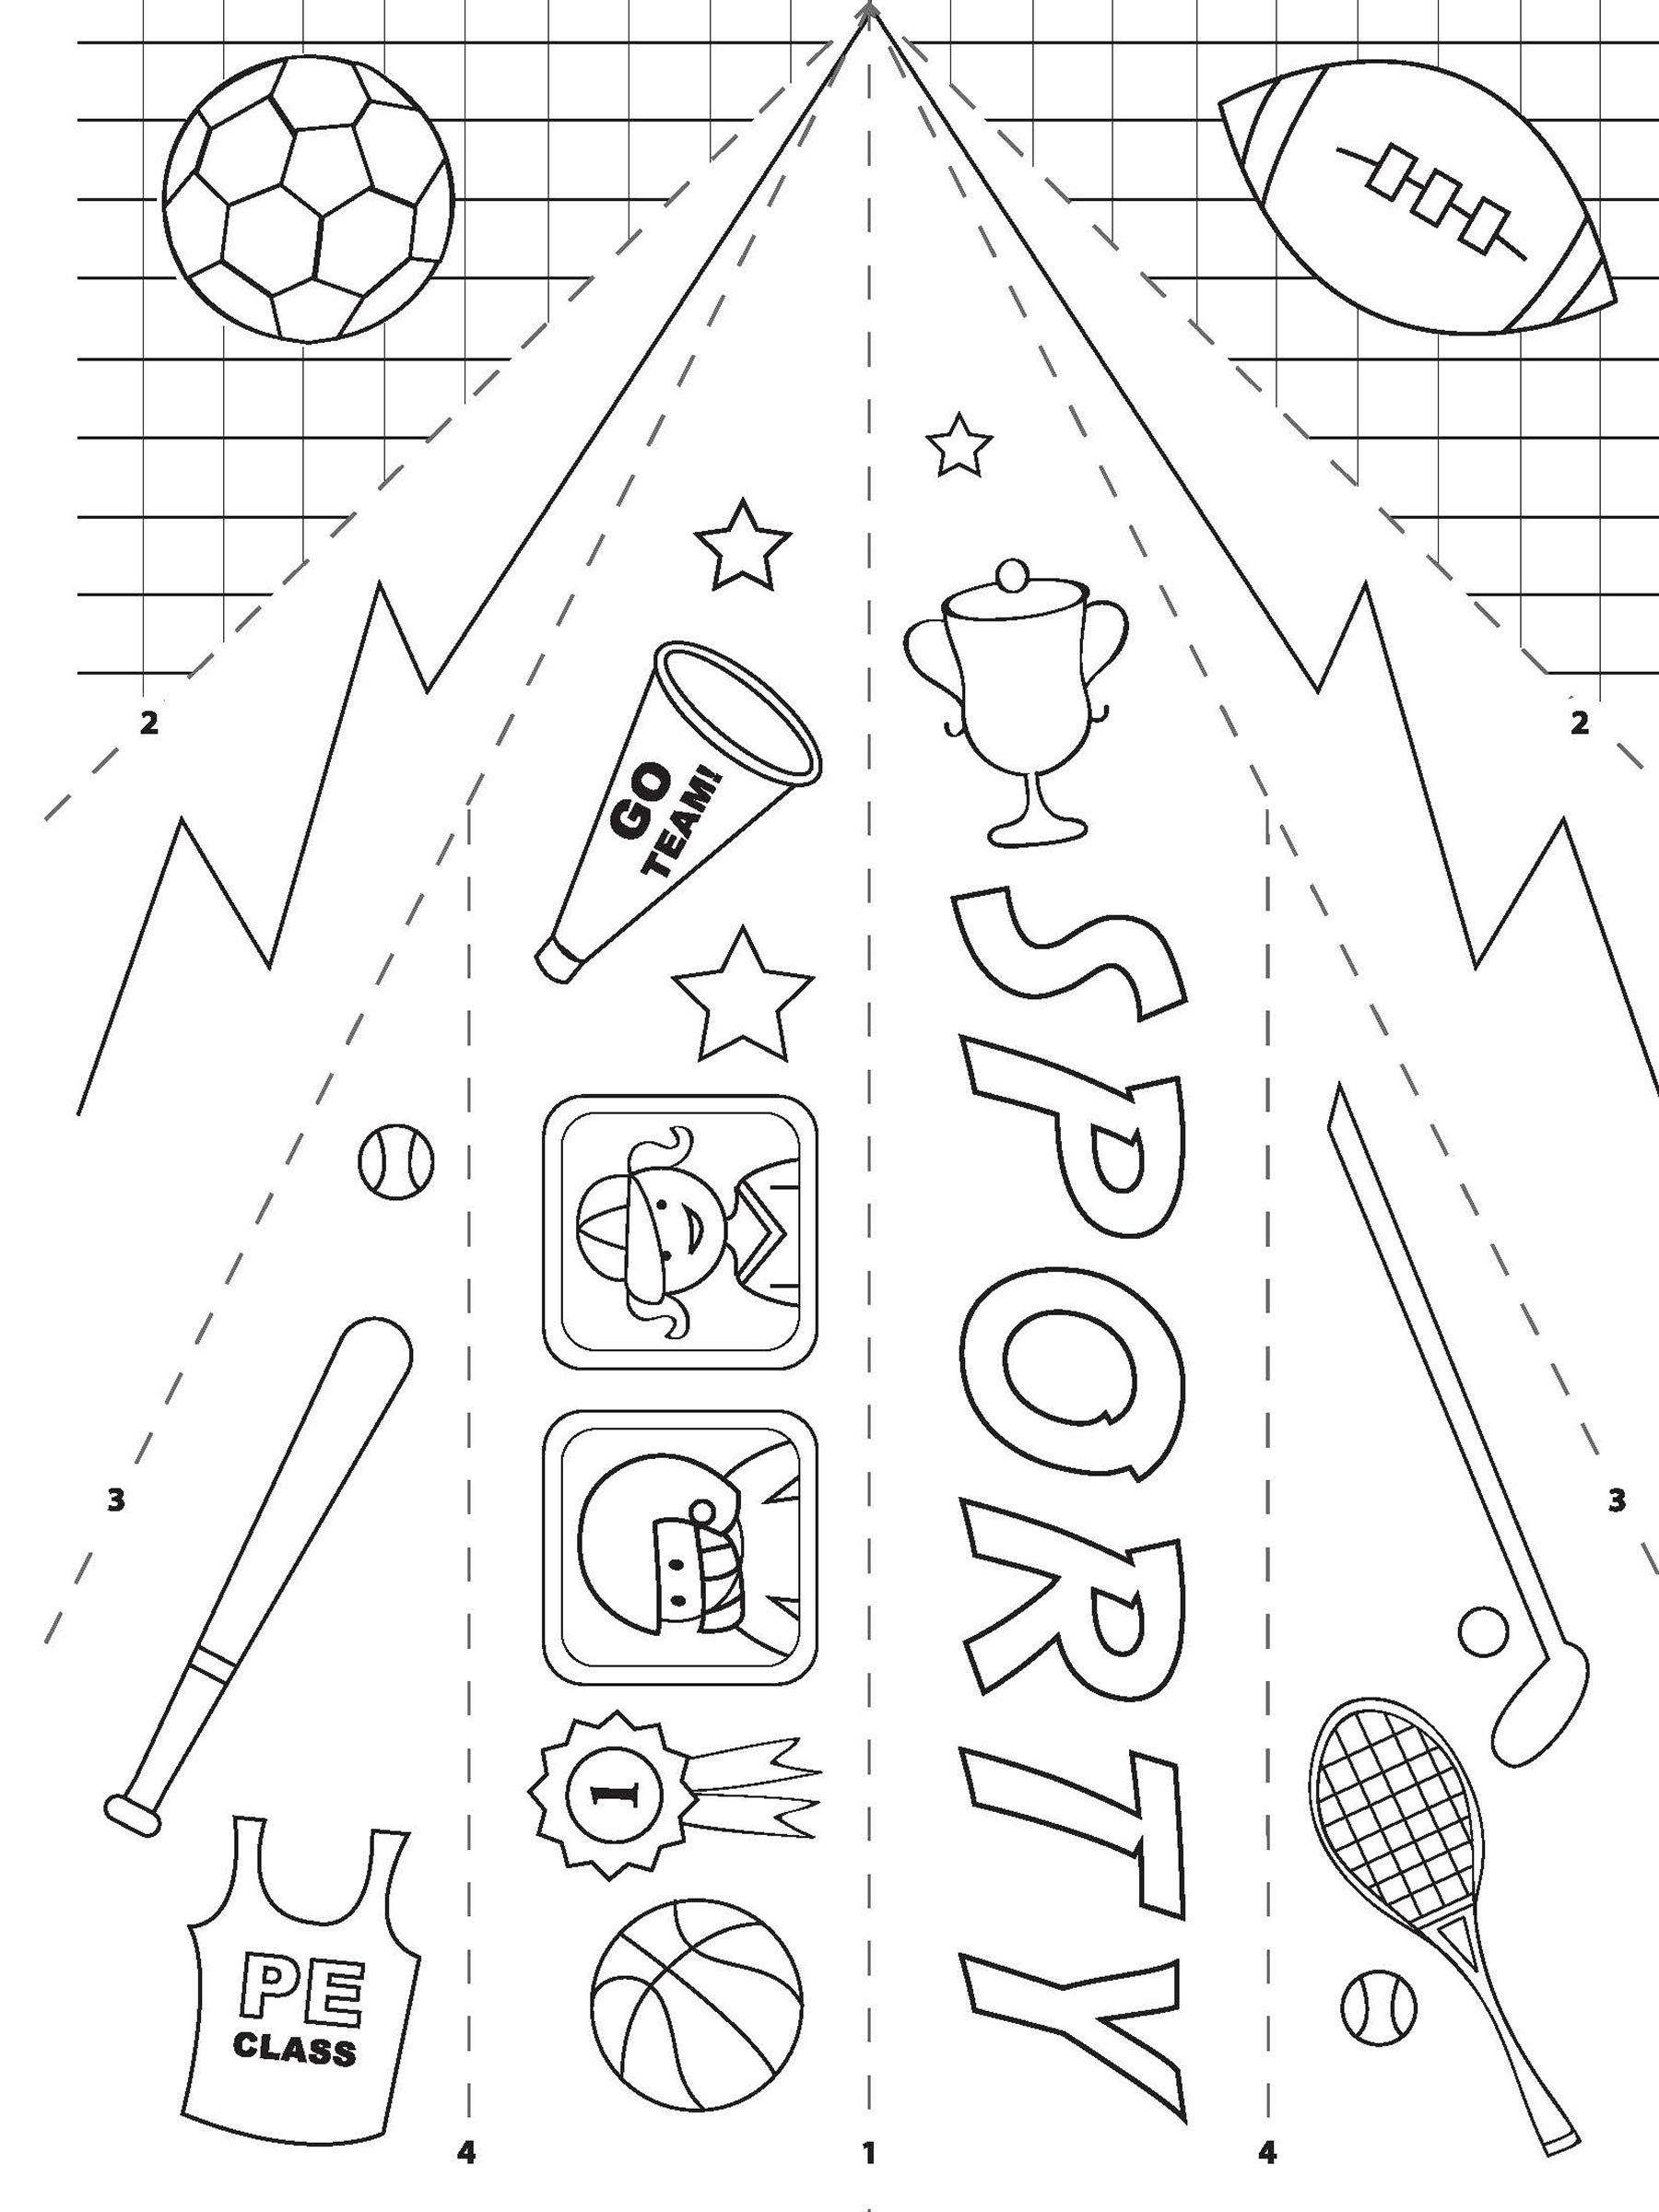 000 Incredible Free Paper Airplane Design Printable Template High Def  Designs-printable TemplatesFull